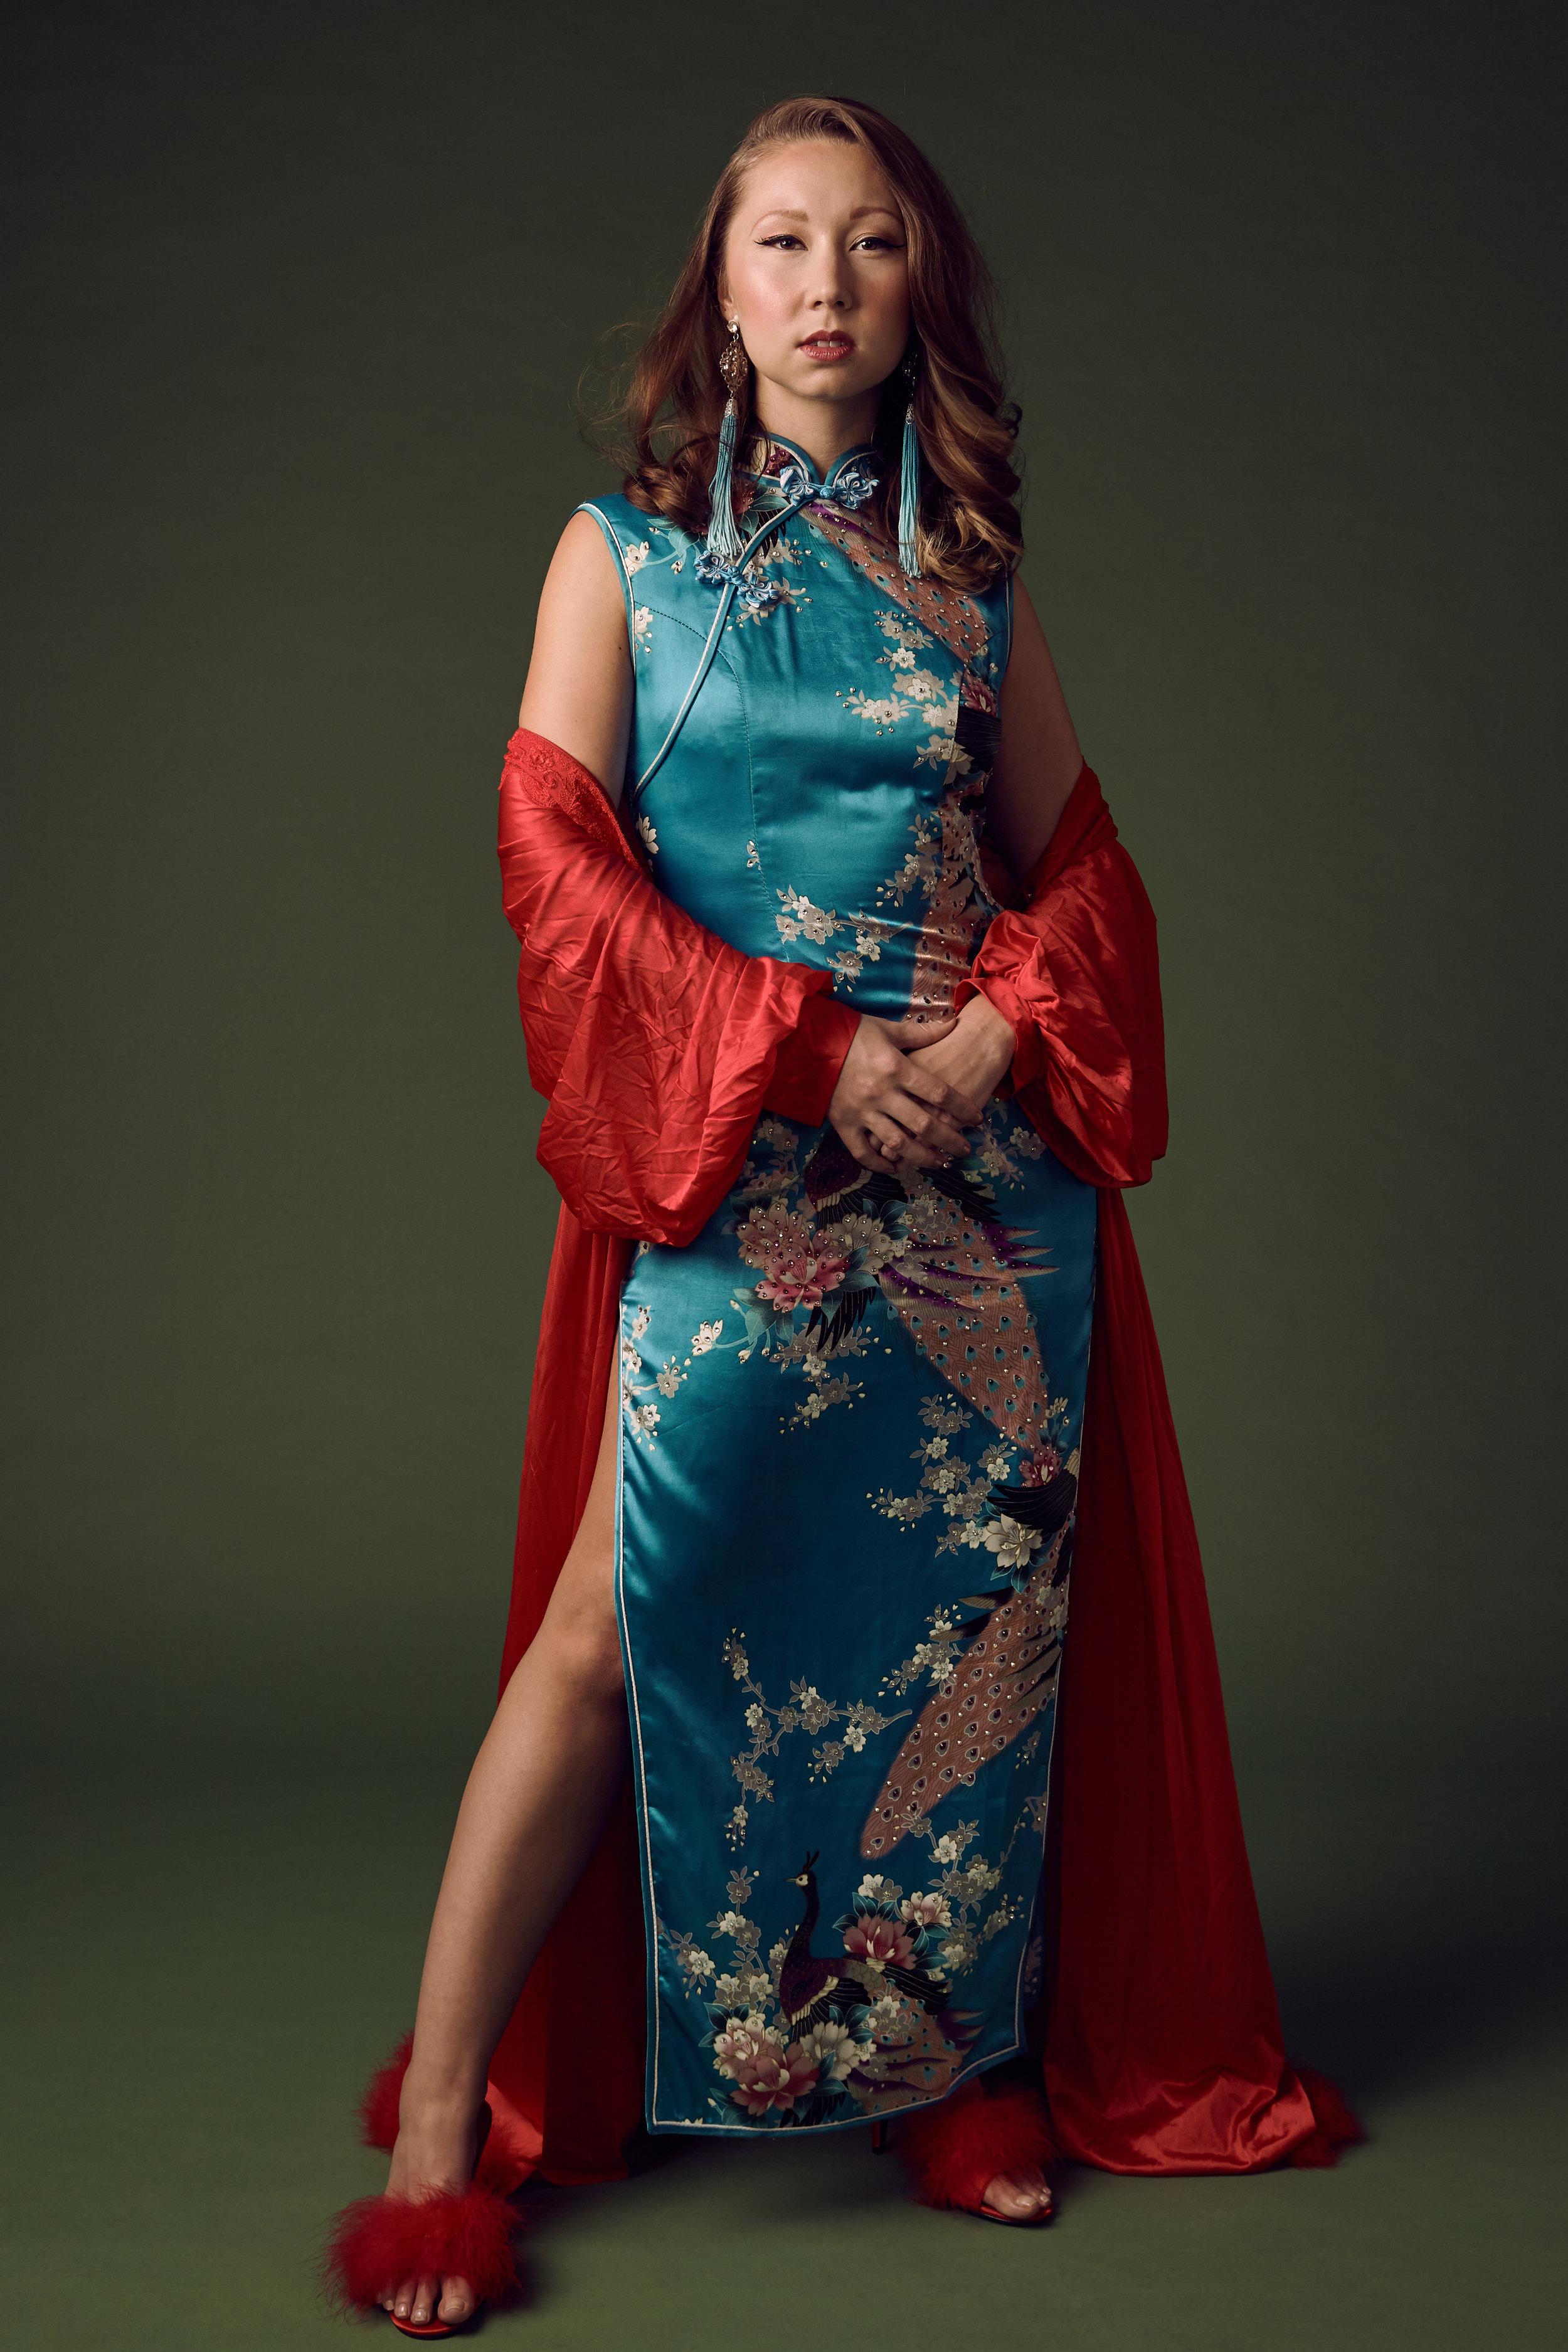 07 - Lilla Koi - Les Femmes Fatales by Christie Vuong.jpg